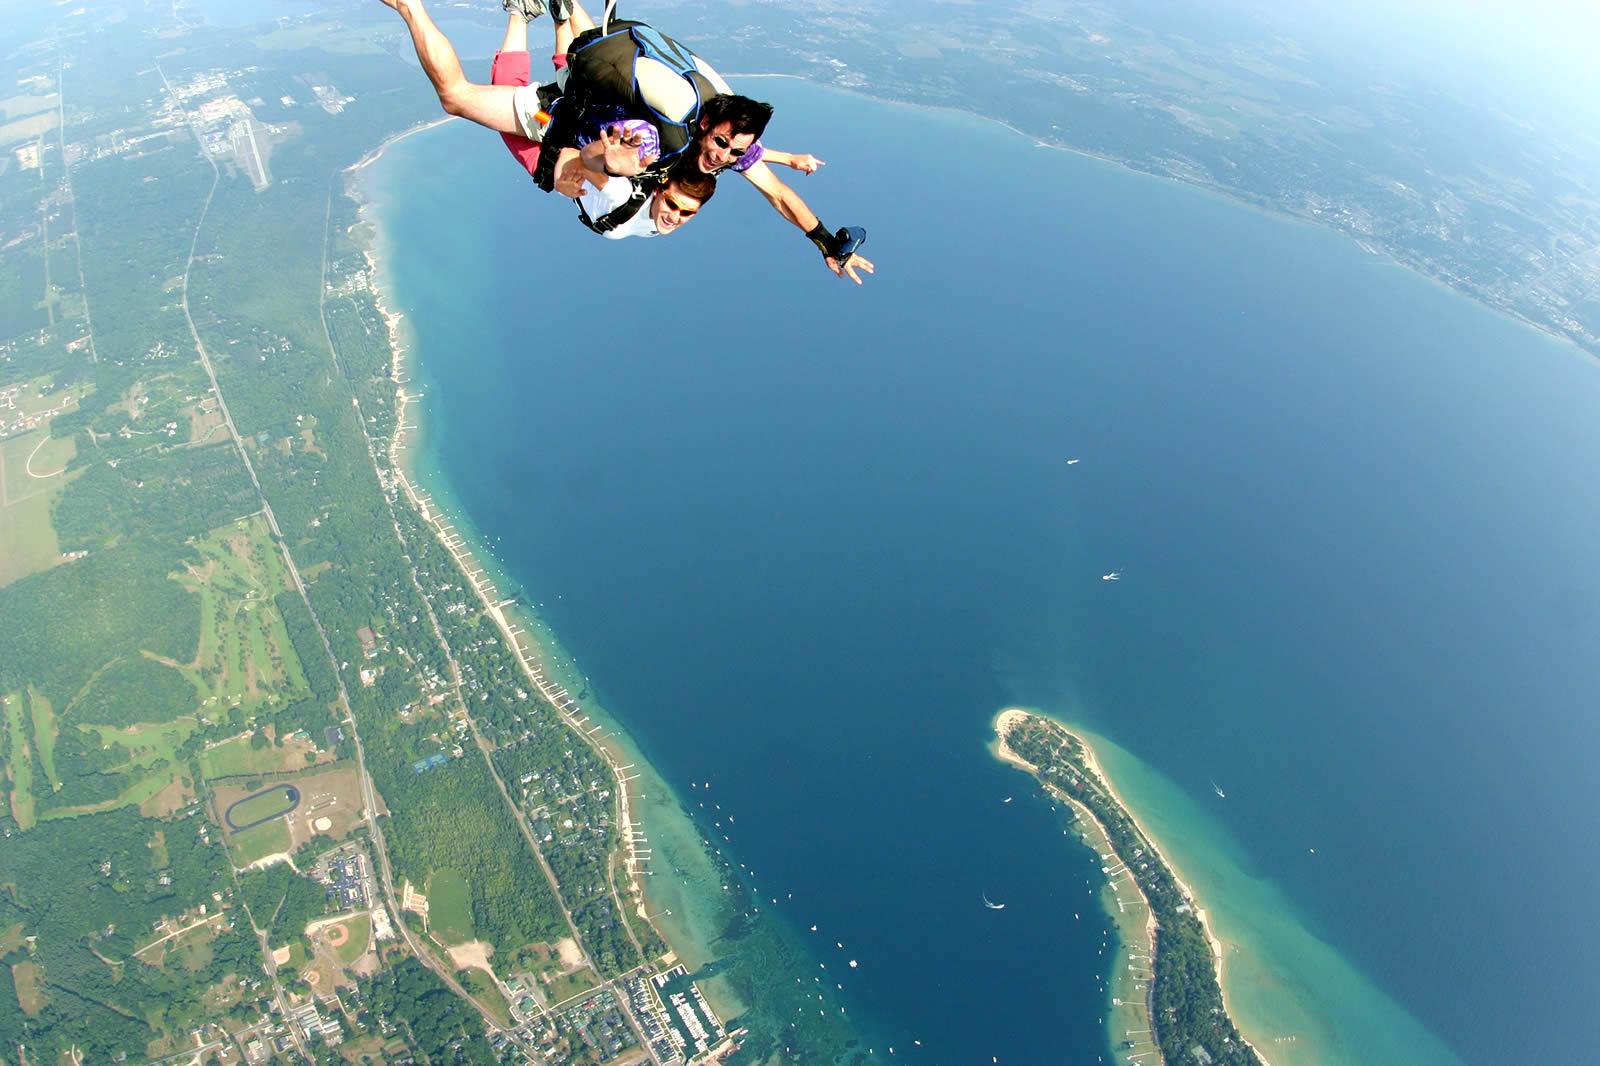 Fall Brithday Wallpaper Skydive Coastal California Life In Free Fall